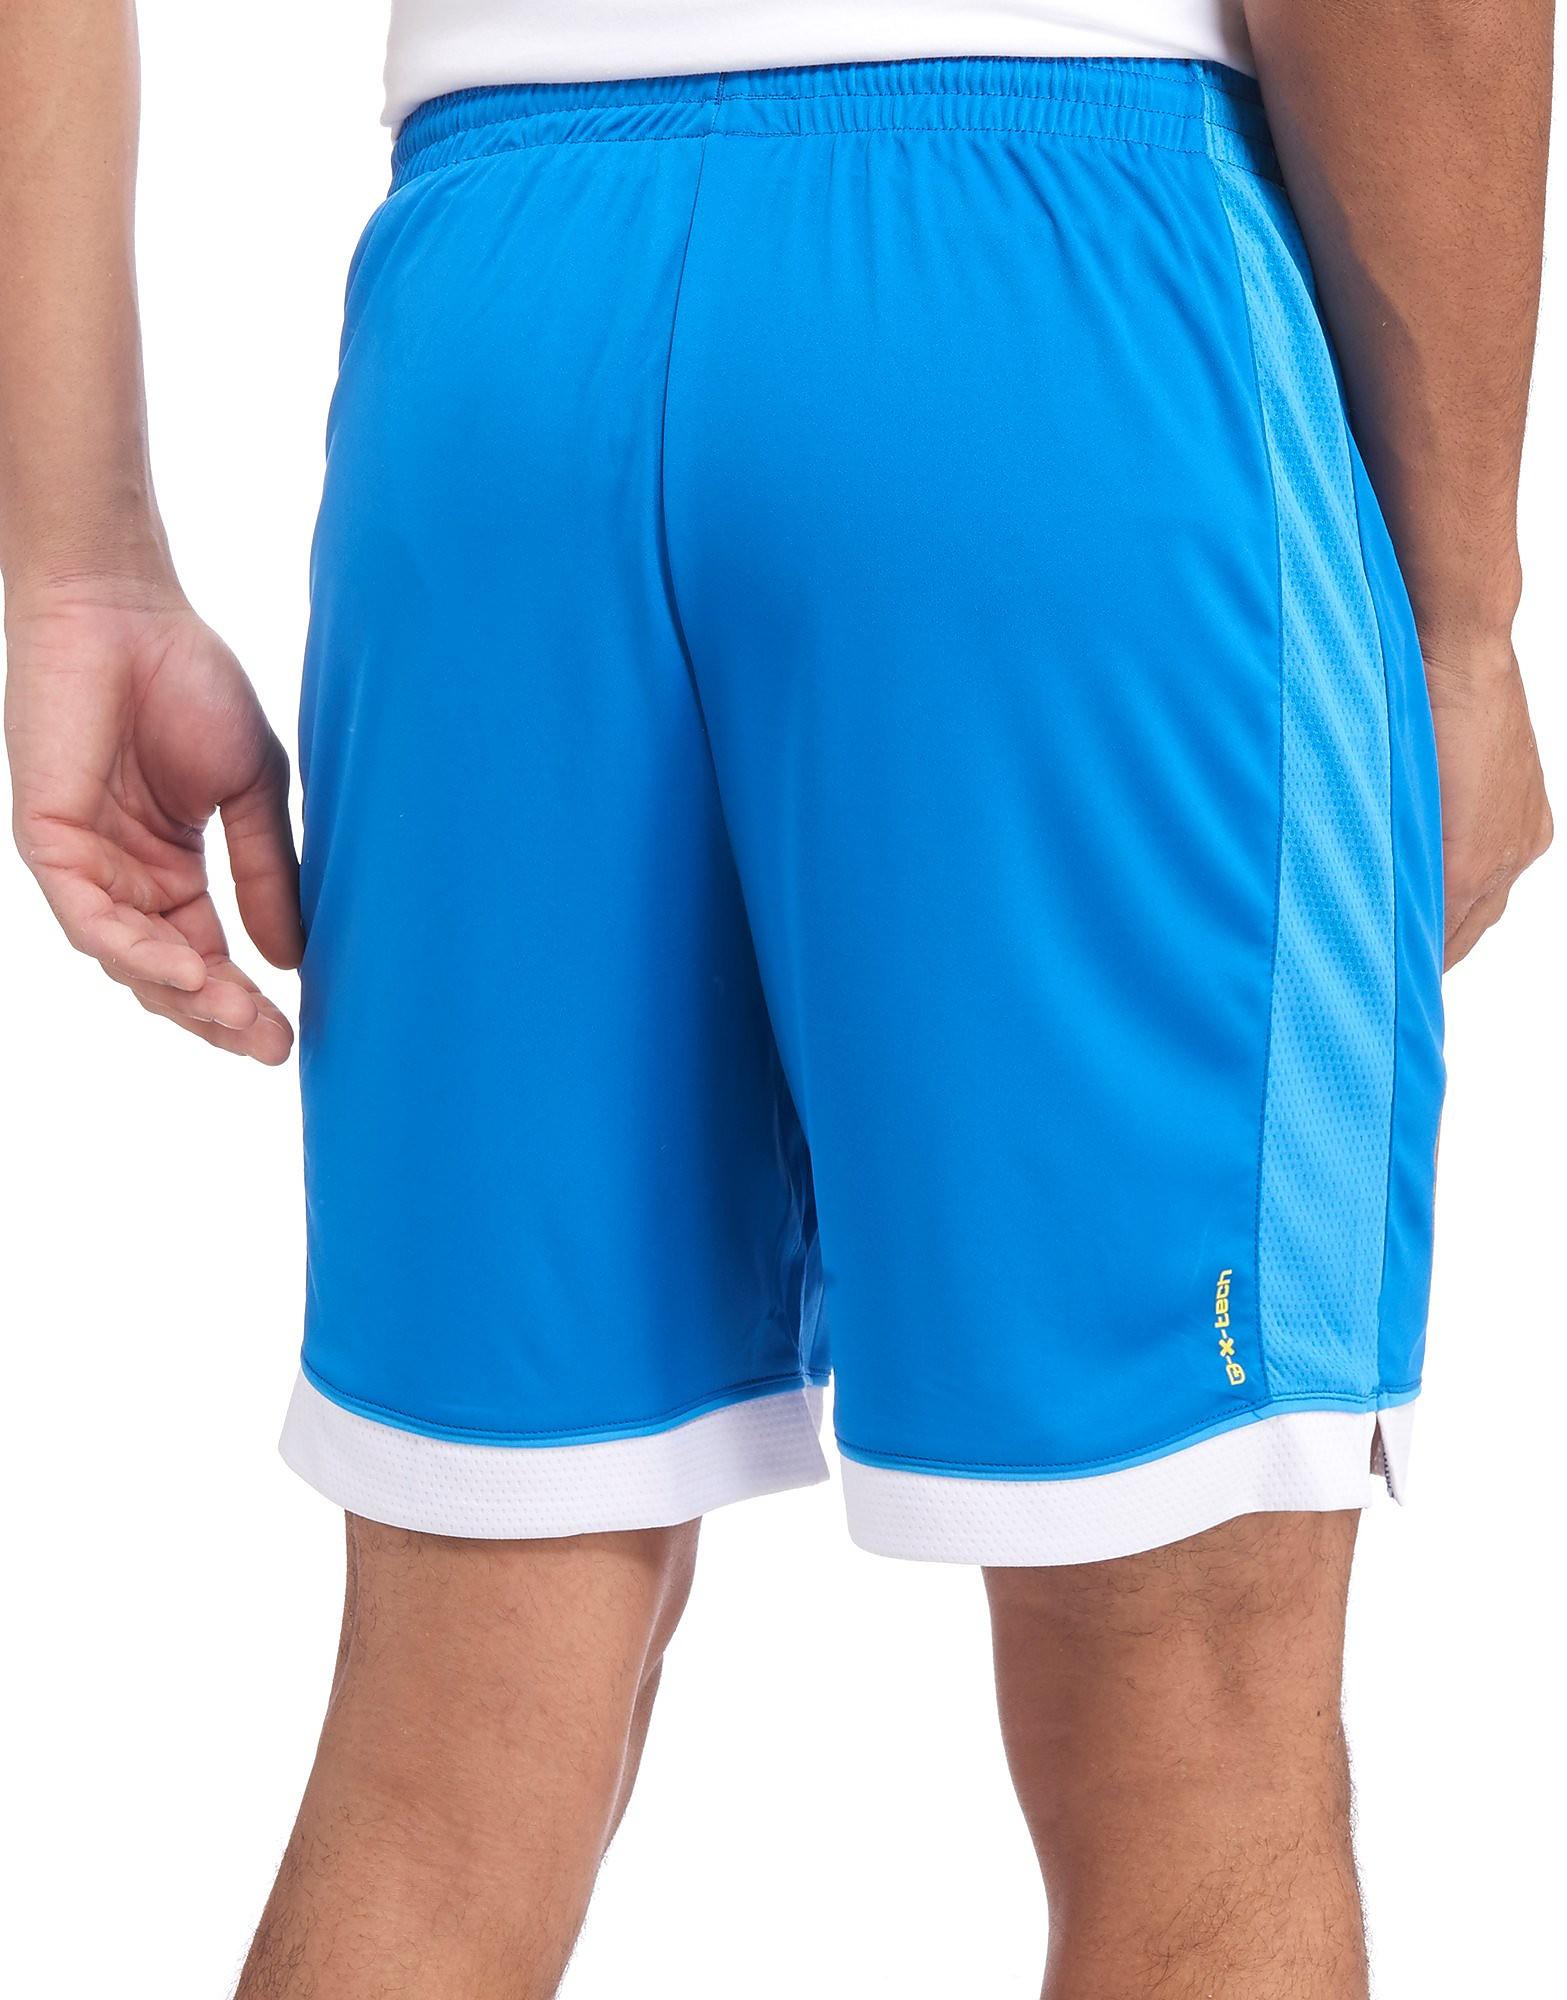 JD AFC Bournemouth 2016/17 Away Shorts